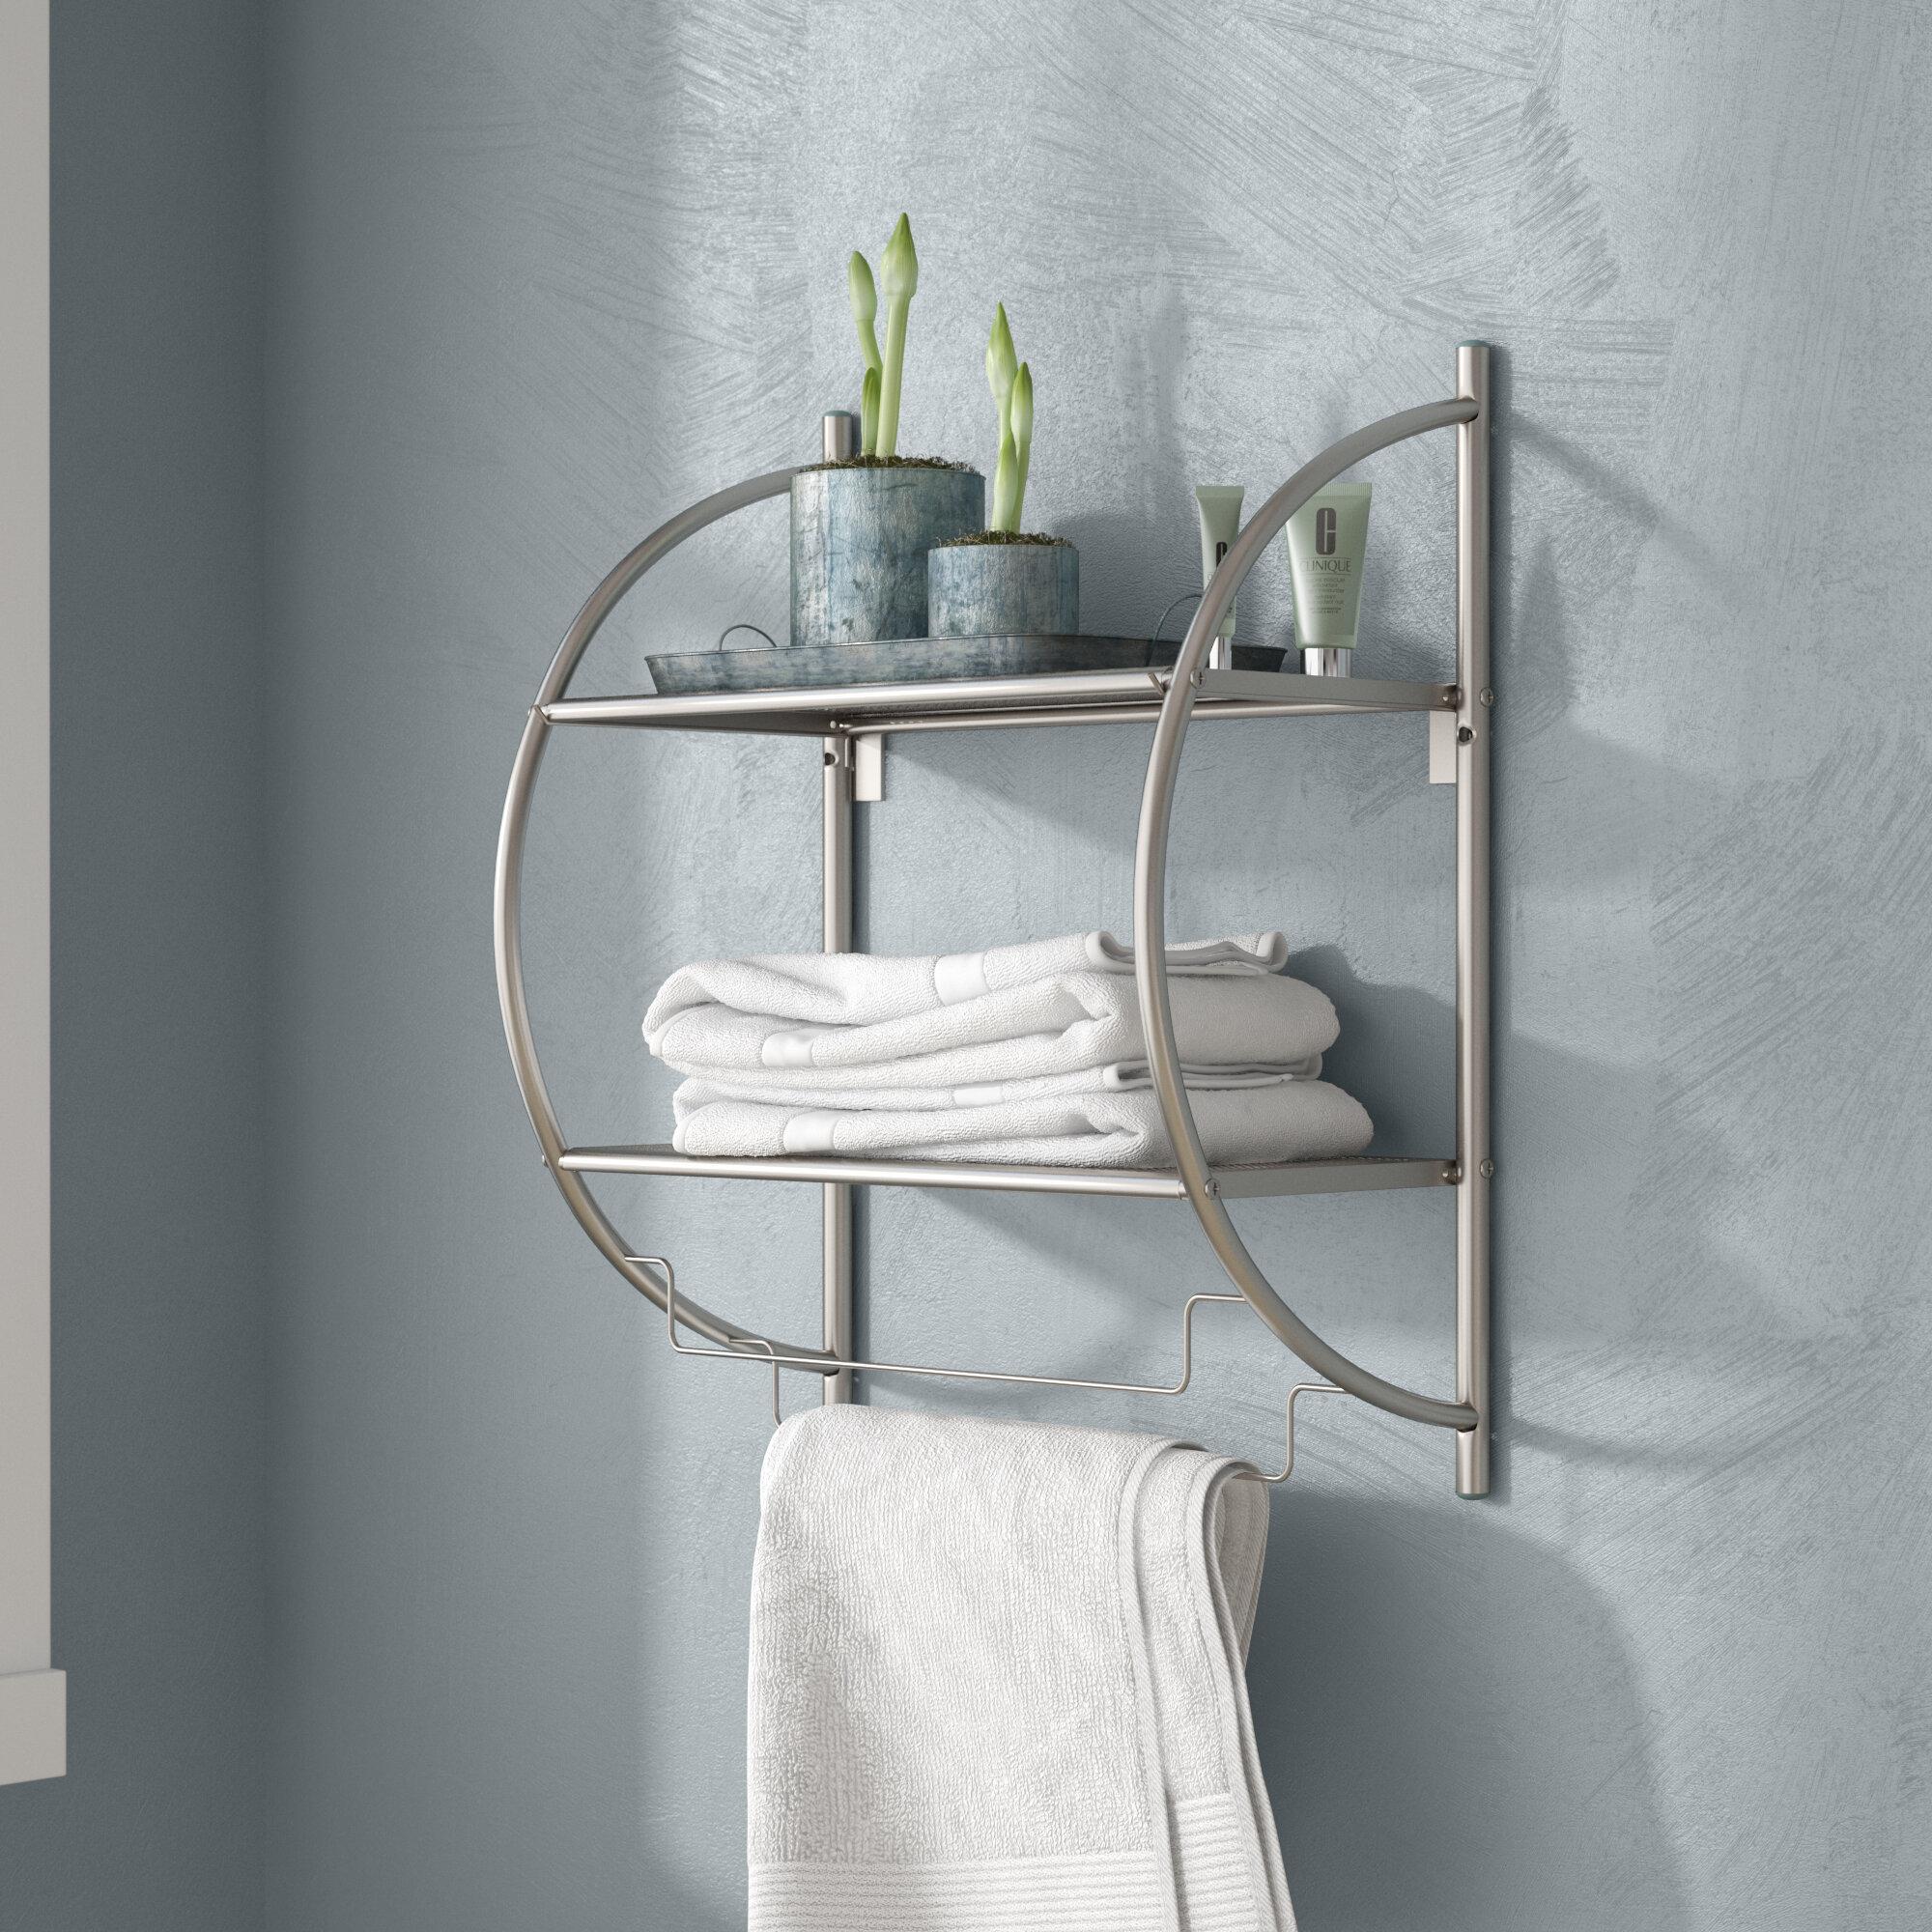 Shelving Wall Mounted Bathroom Cabinets Shelving You Ll Love In 2021 Wayfair